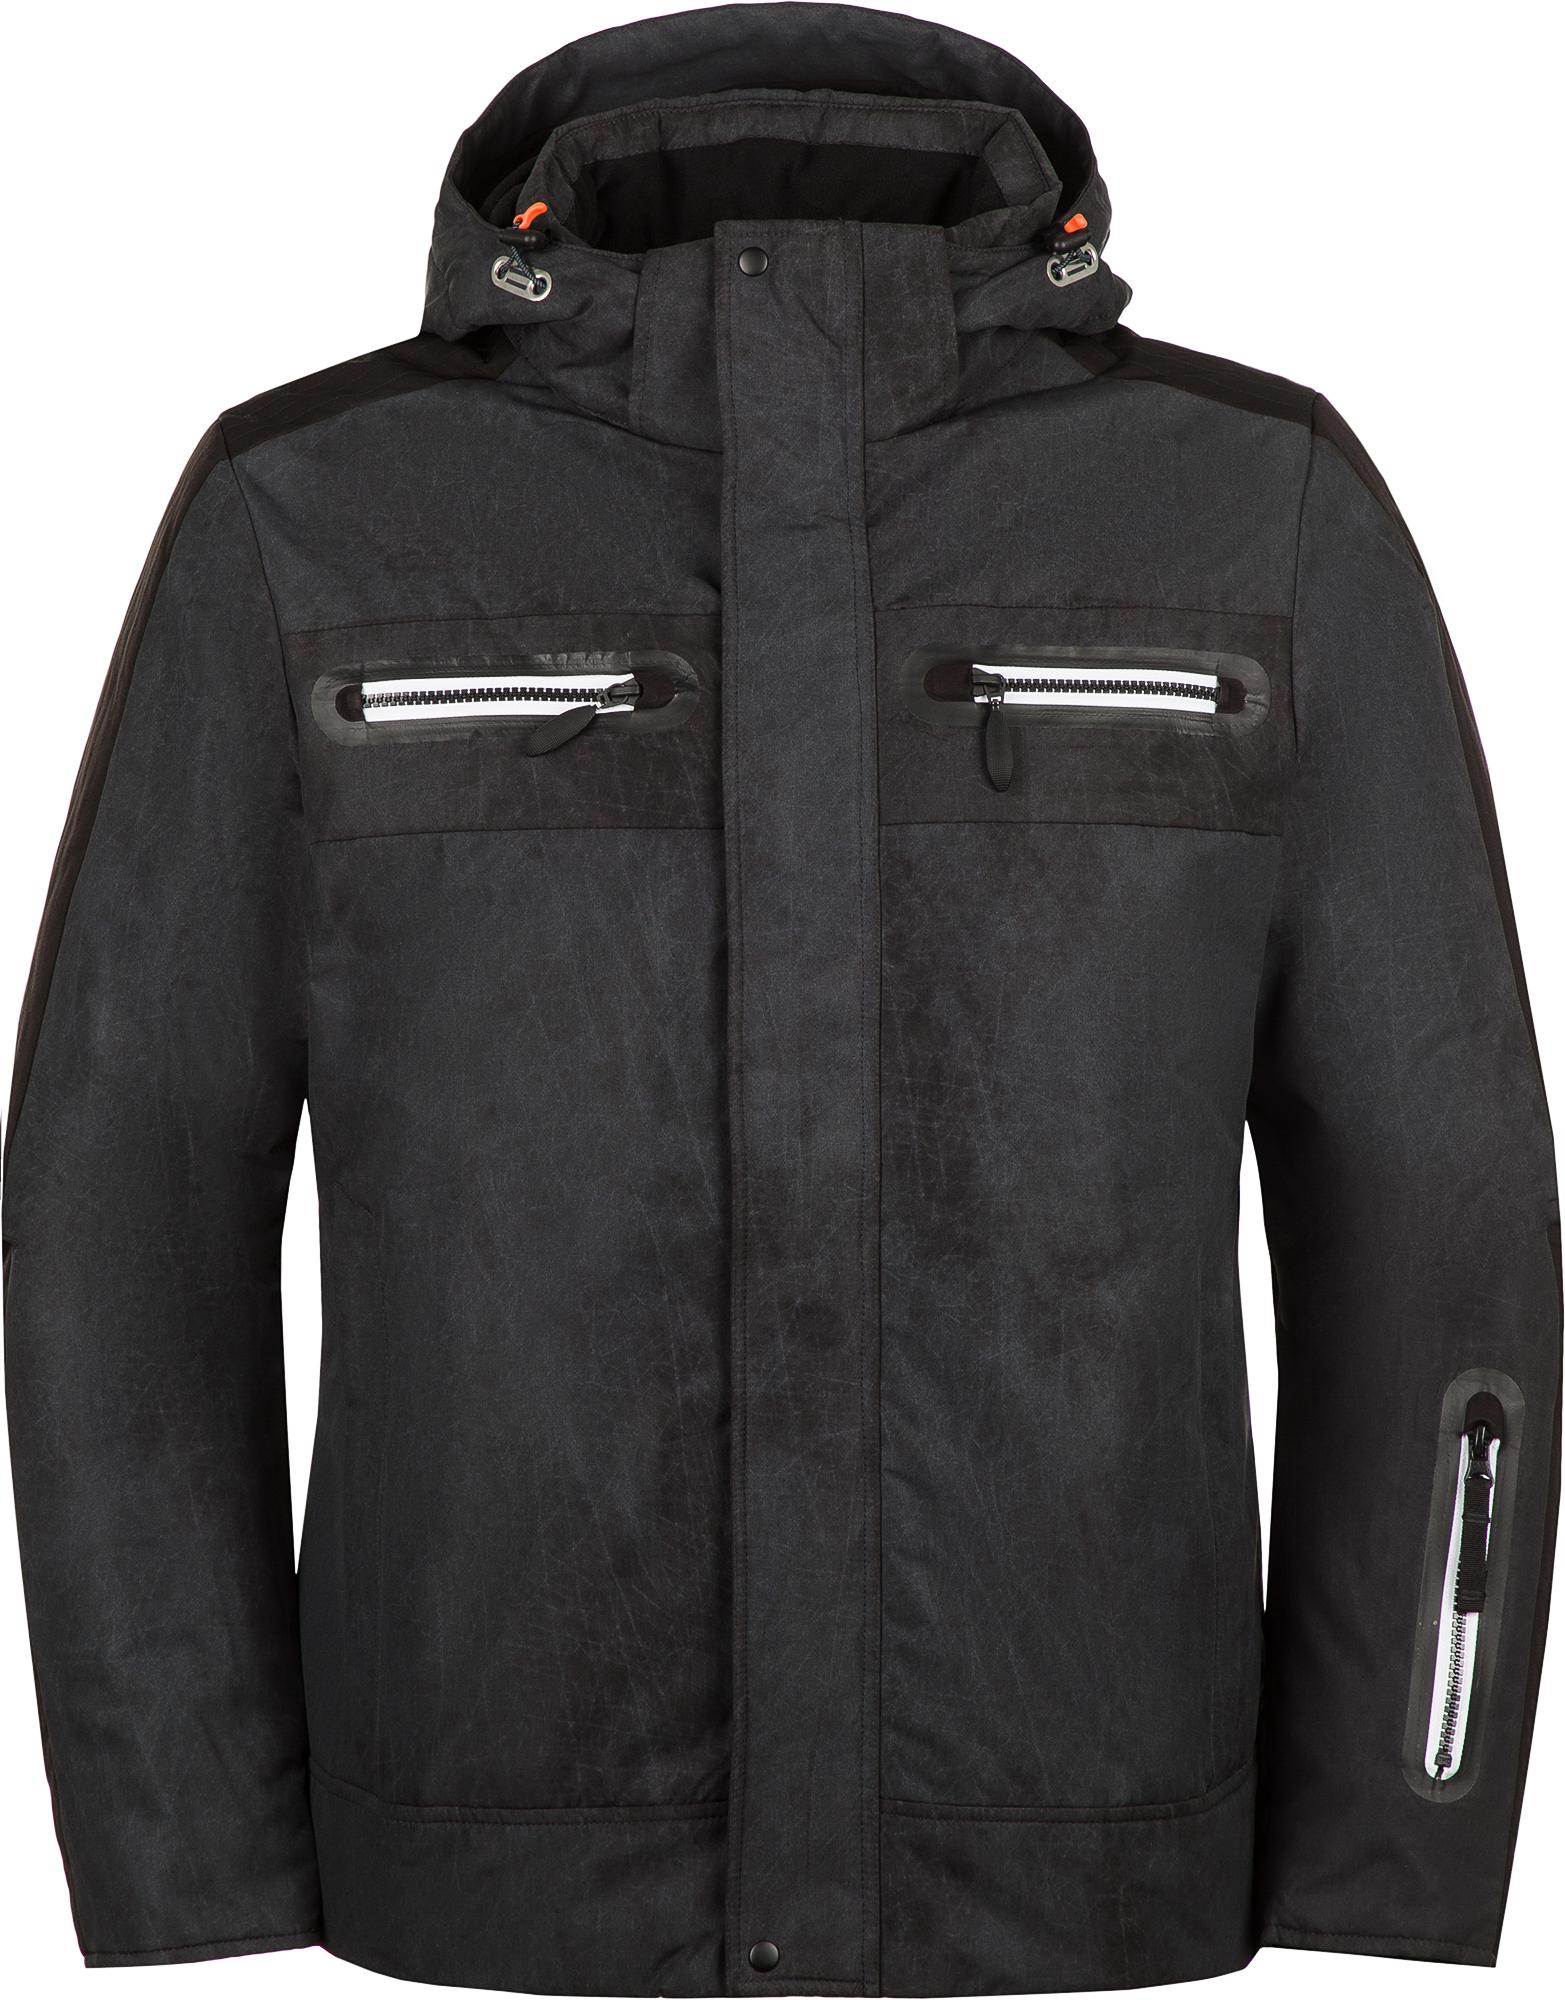 IcePeak Куртка утепленная мужская IcePeak Easton, размер 52 аксессуары для палаток тентов и шатров easton locking 340